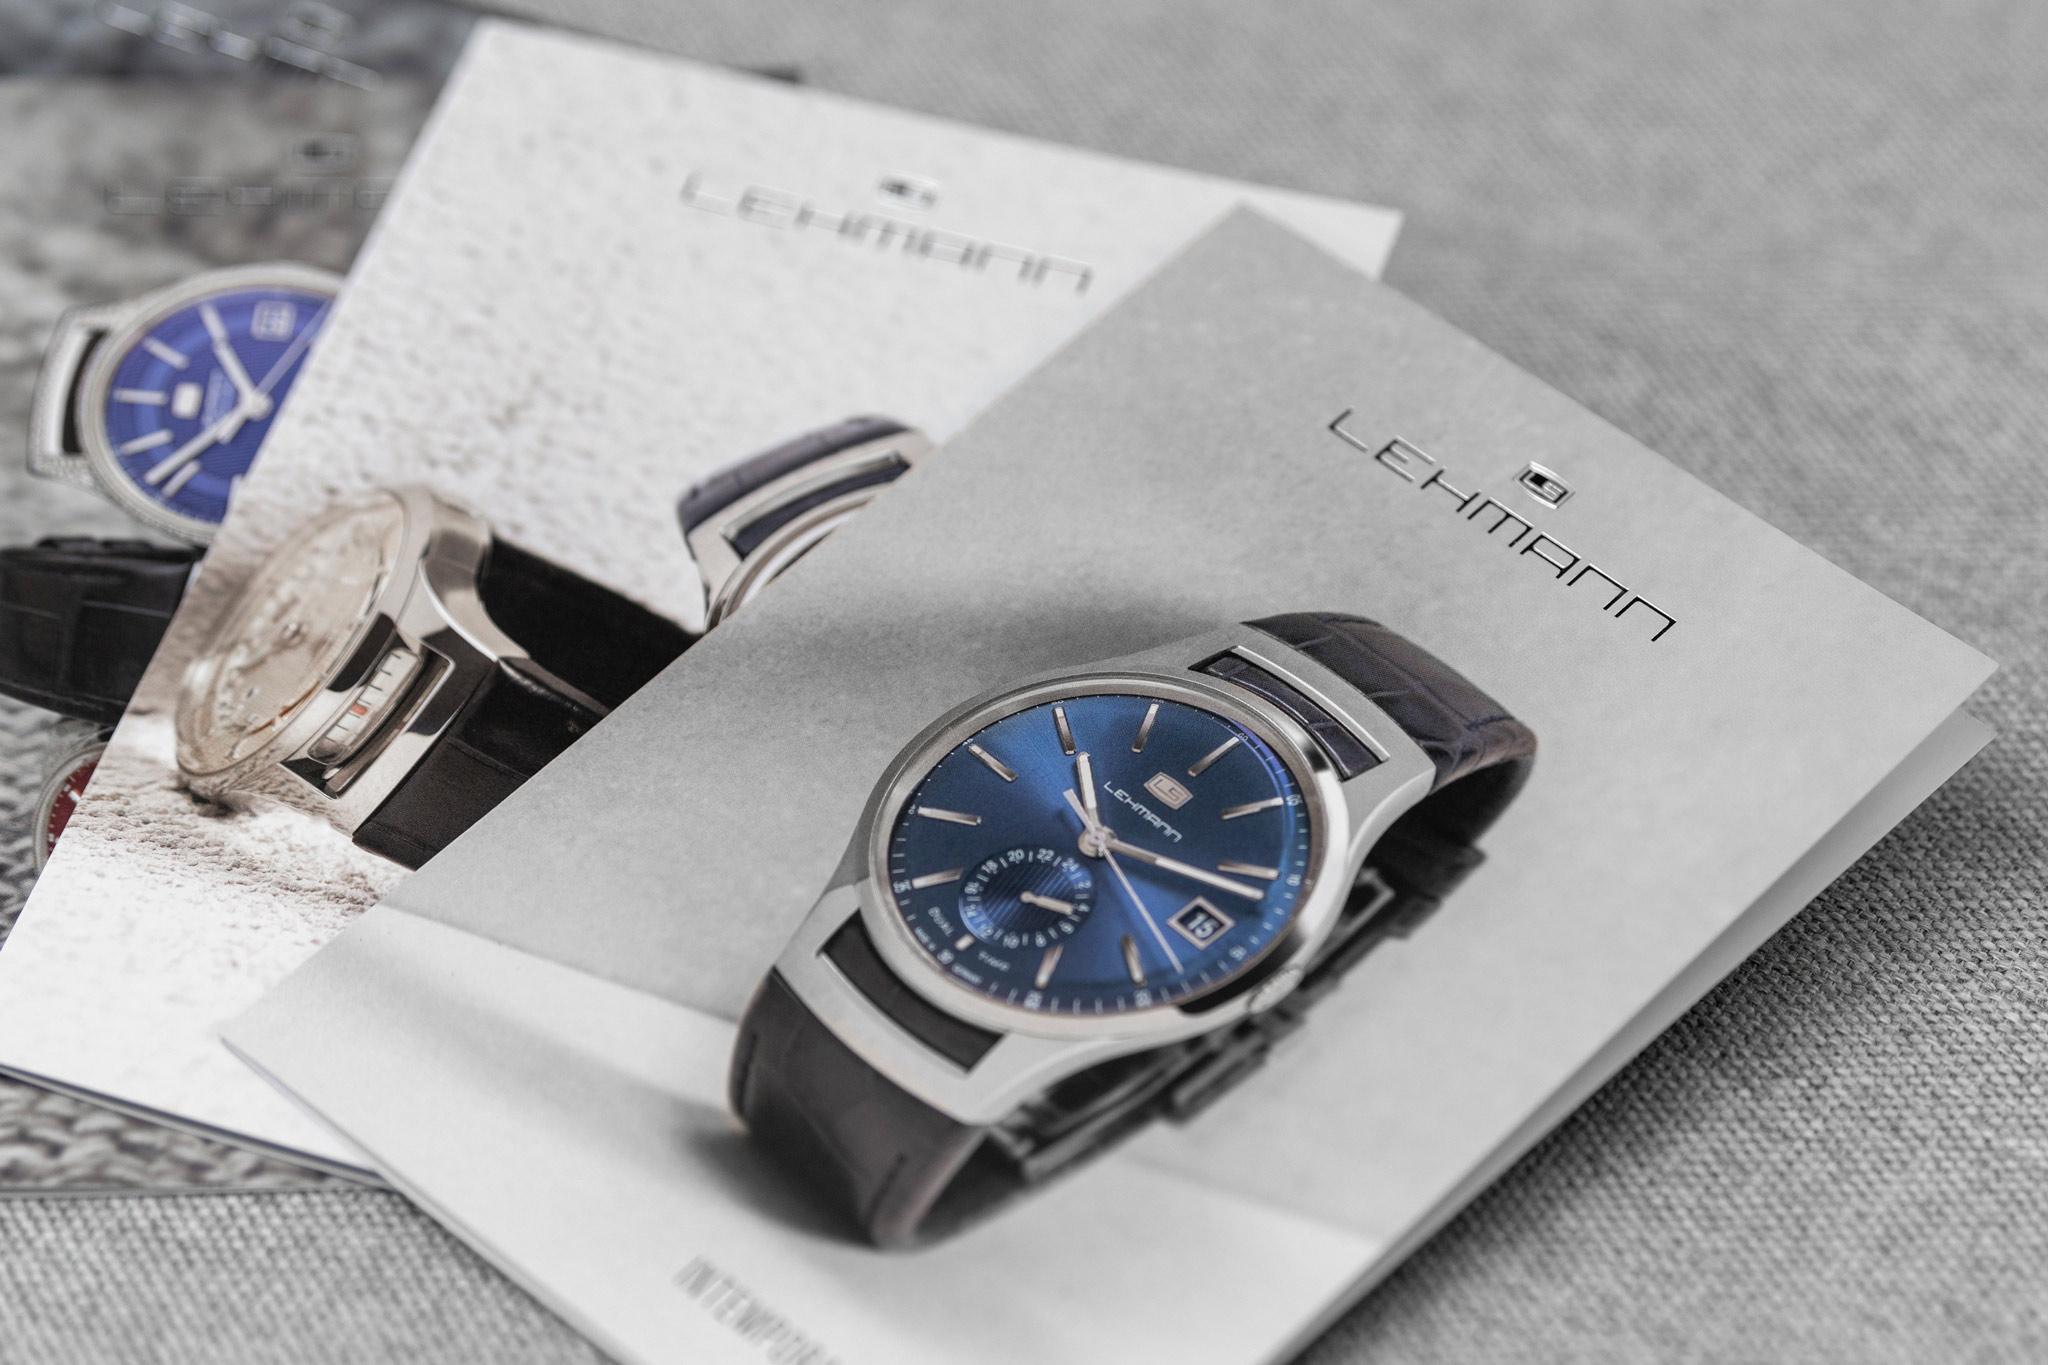 Lehmann Uhren Postkarten